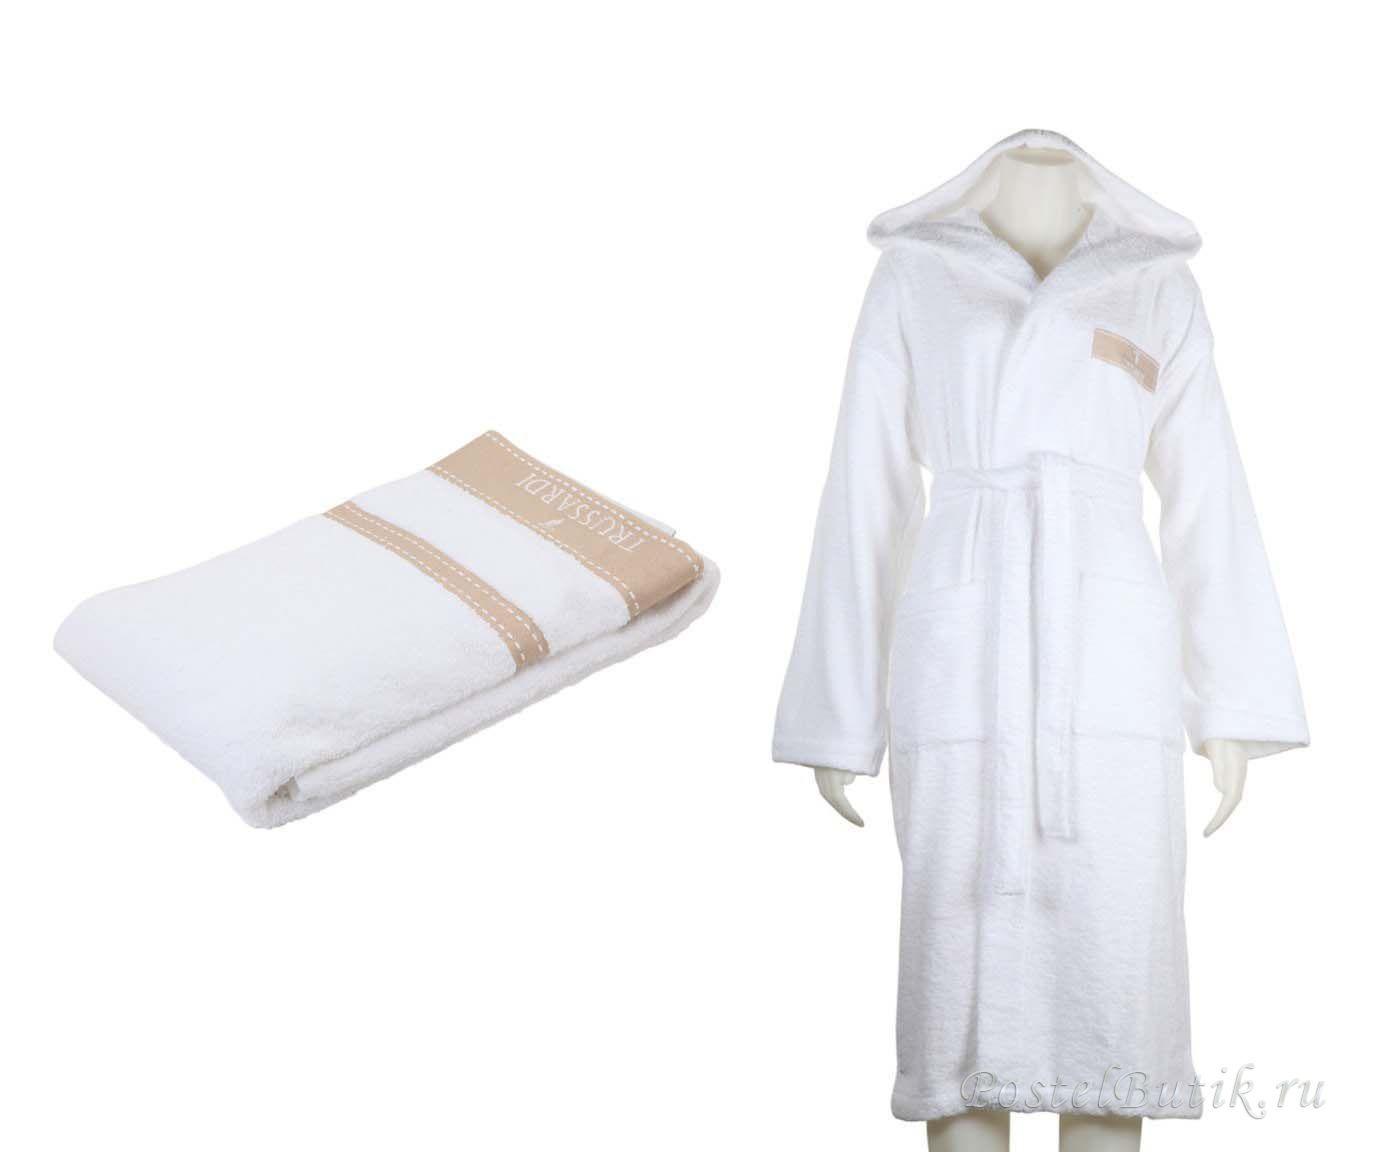 Наборы полотенец Набор полотенец 3 шт Trussardi Golf и халат M белый mahrovy-halat-i-polotentsa-logo-ot-trussardi.jpg